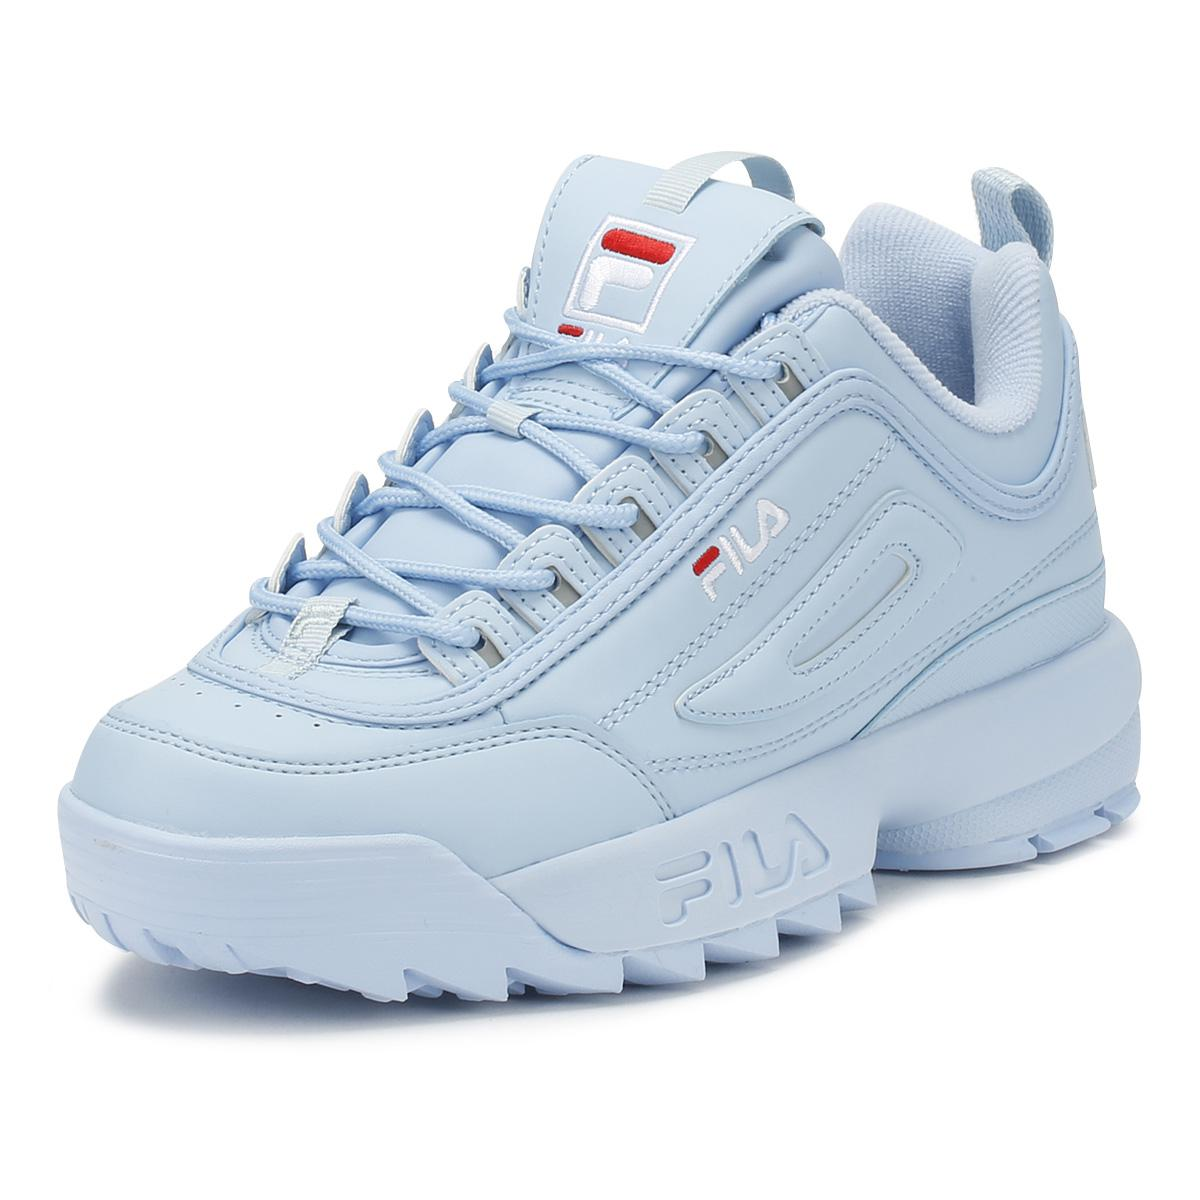 2ff6eba9e0d9 separation shoes 09416 b2244 Lyst - Fila Disruptor Ii Premium Womens Angel  Falls Blue Tra .